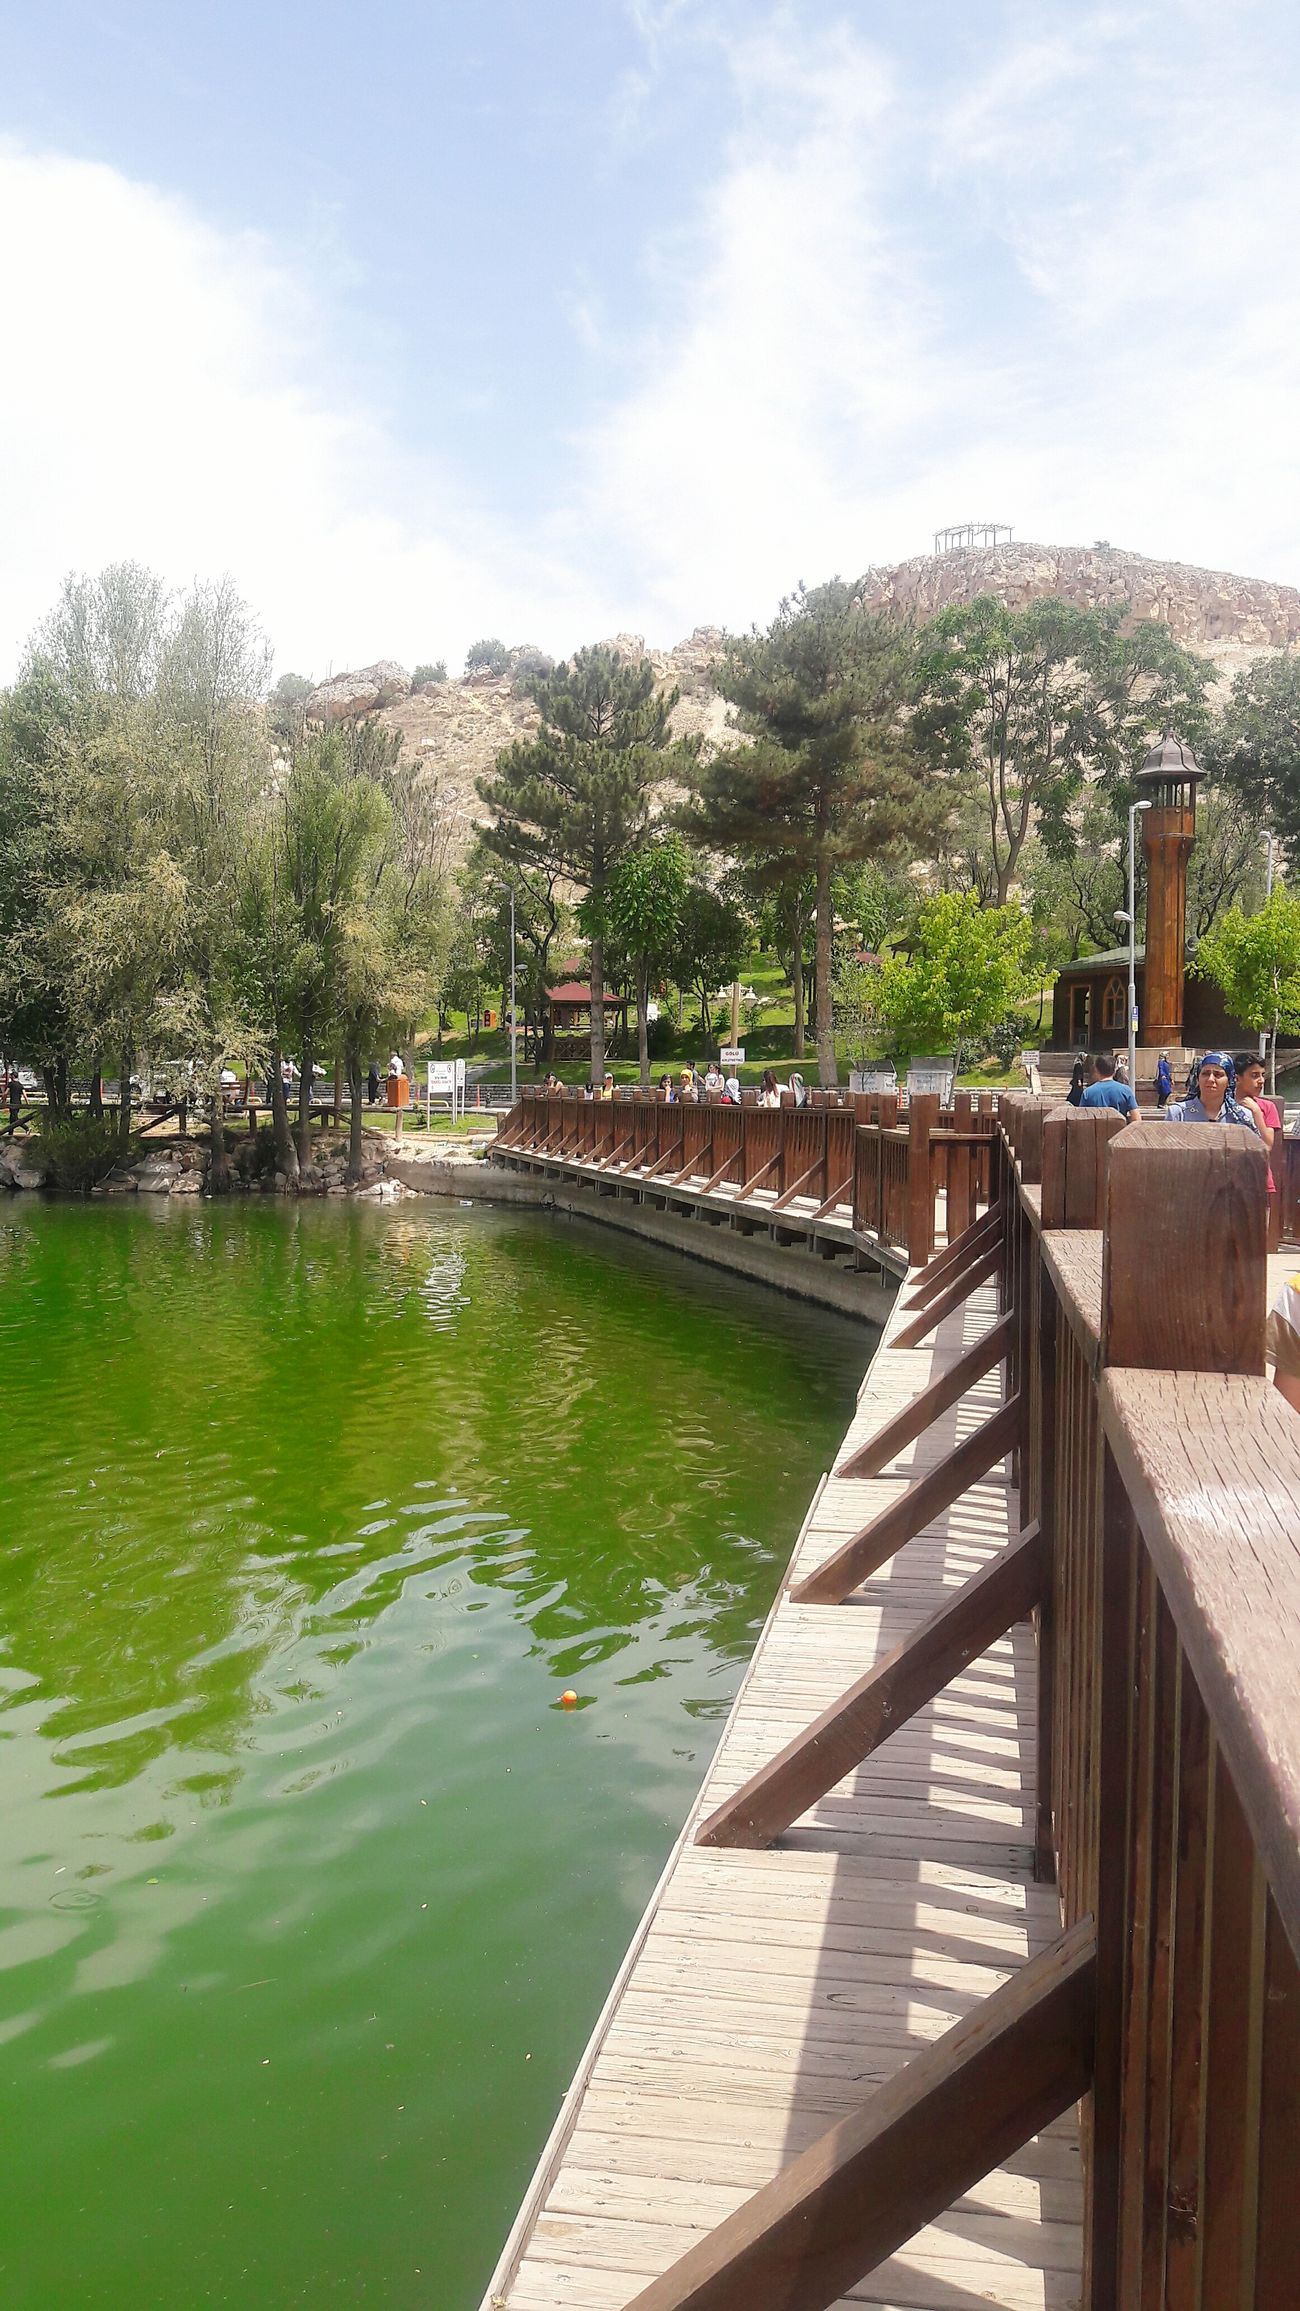 Malatya Turgutözal Parkı Köprüde Dogal Yeşil Doğa Yesili Taking Photos Balık Kaynağı Trippy!